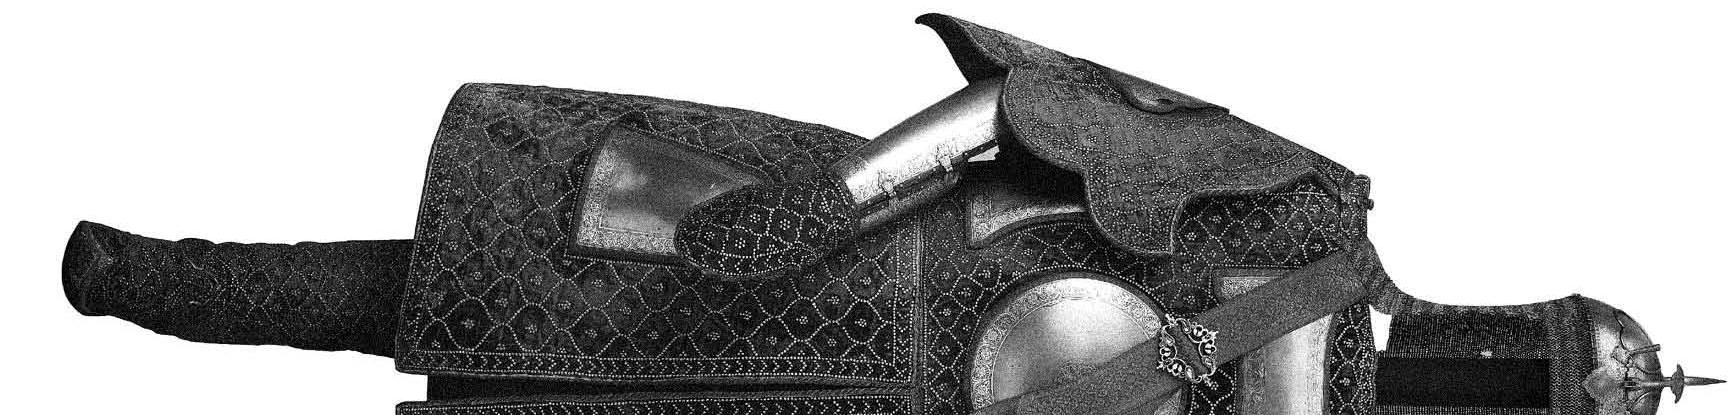 Armure orientale complète avec bottes hautes. De Lahore,Inde, 1770 Courtesy of Trustees of the Wallace Collection, London